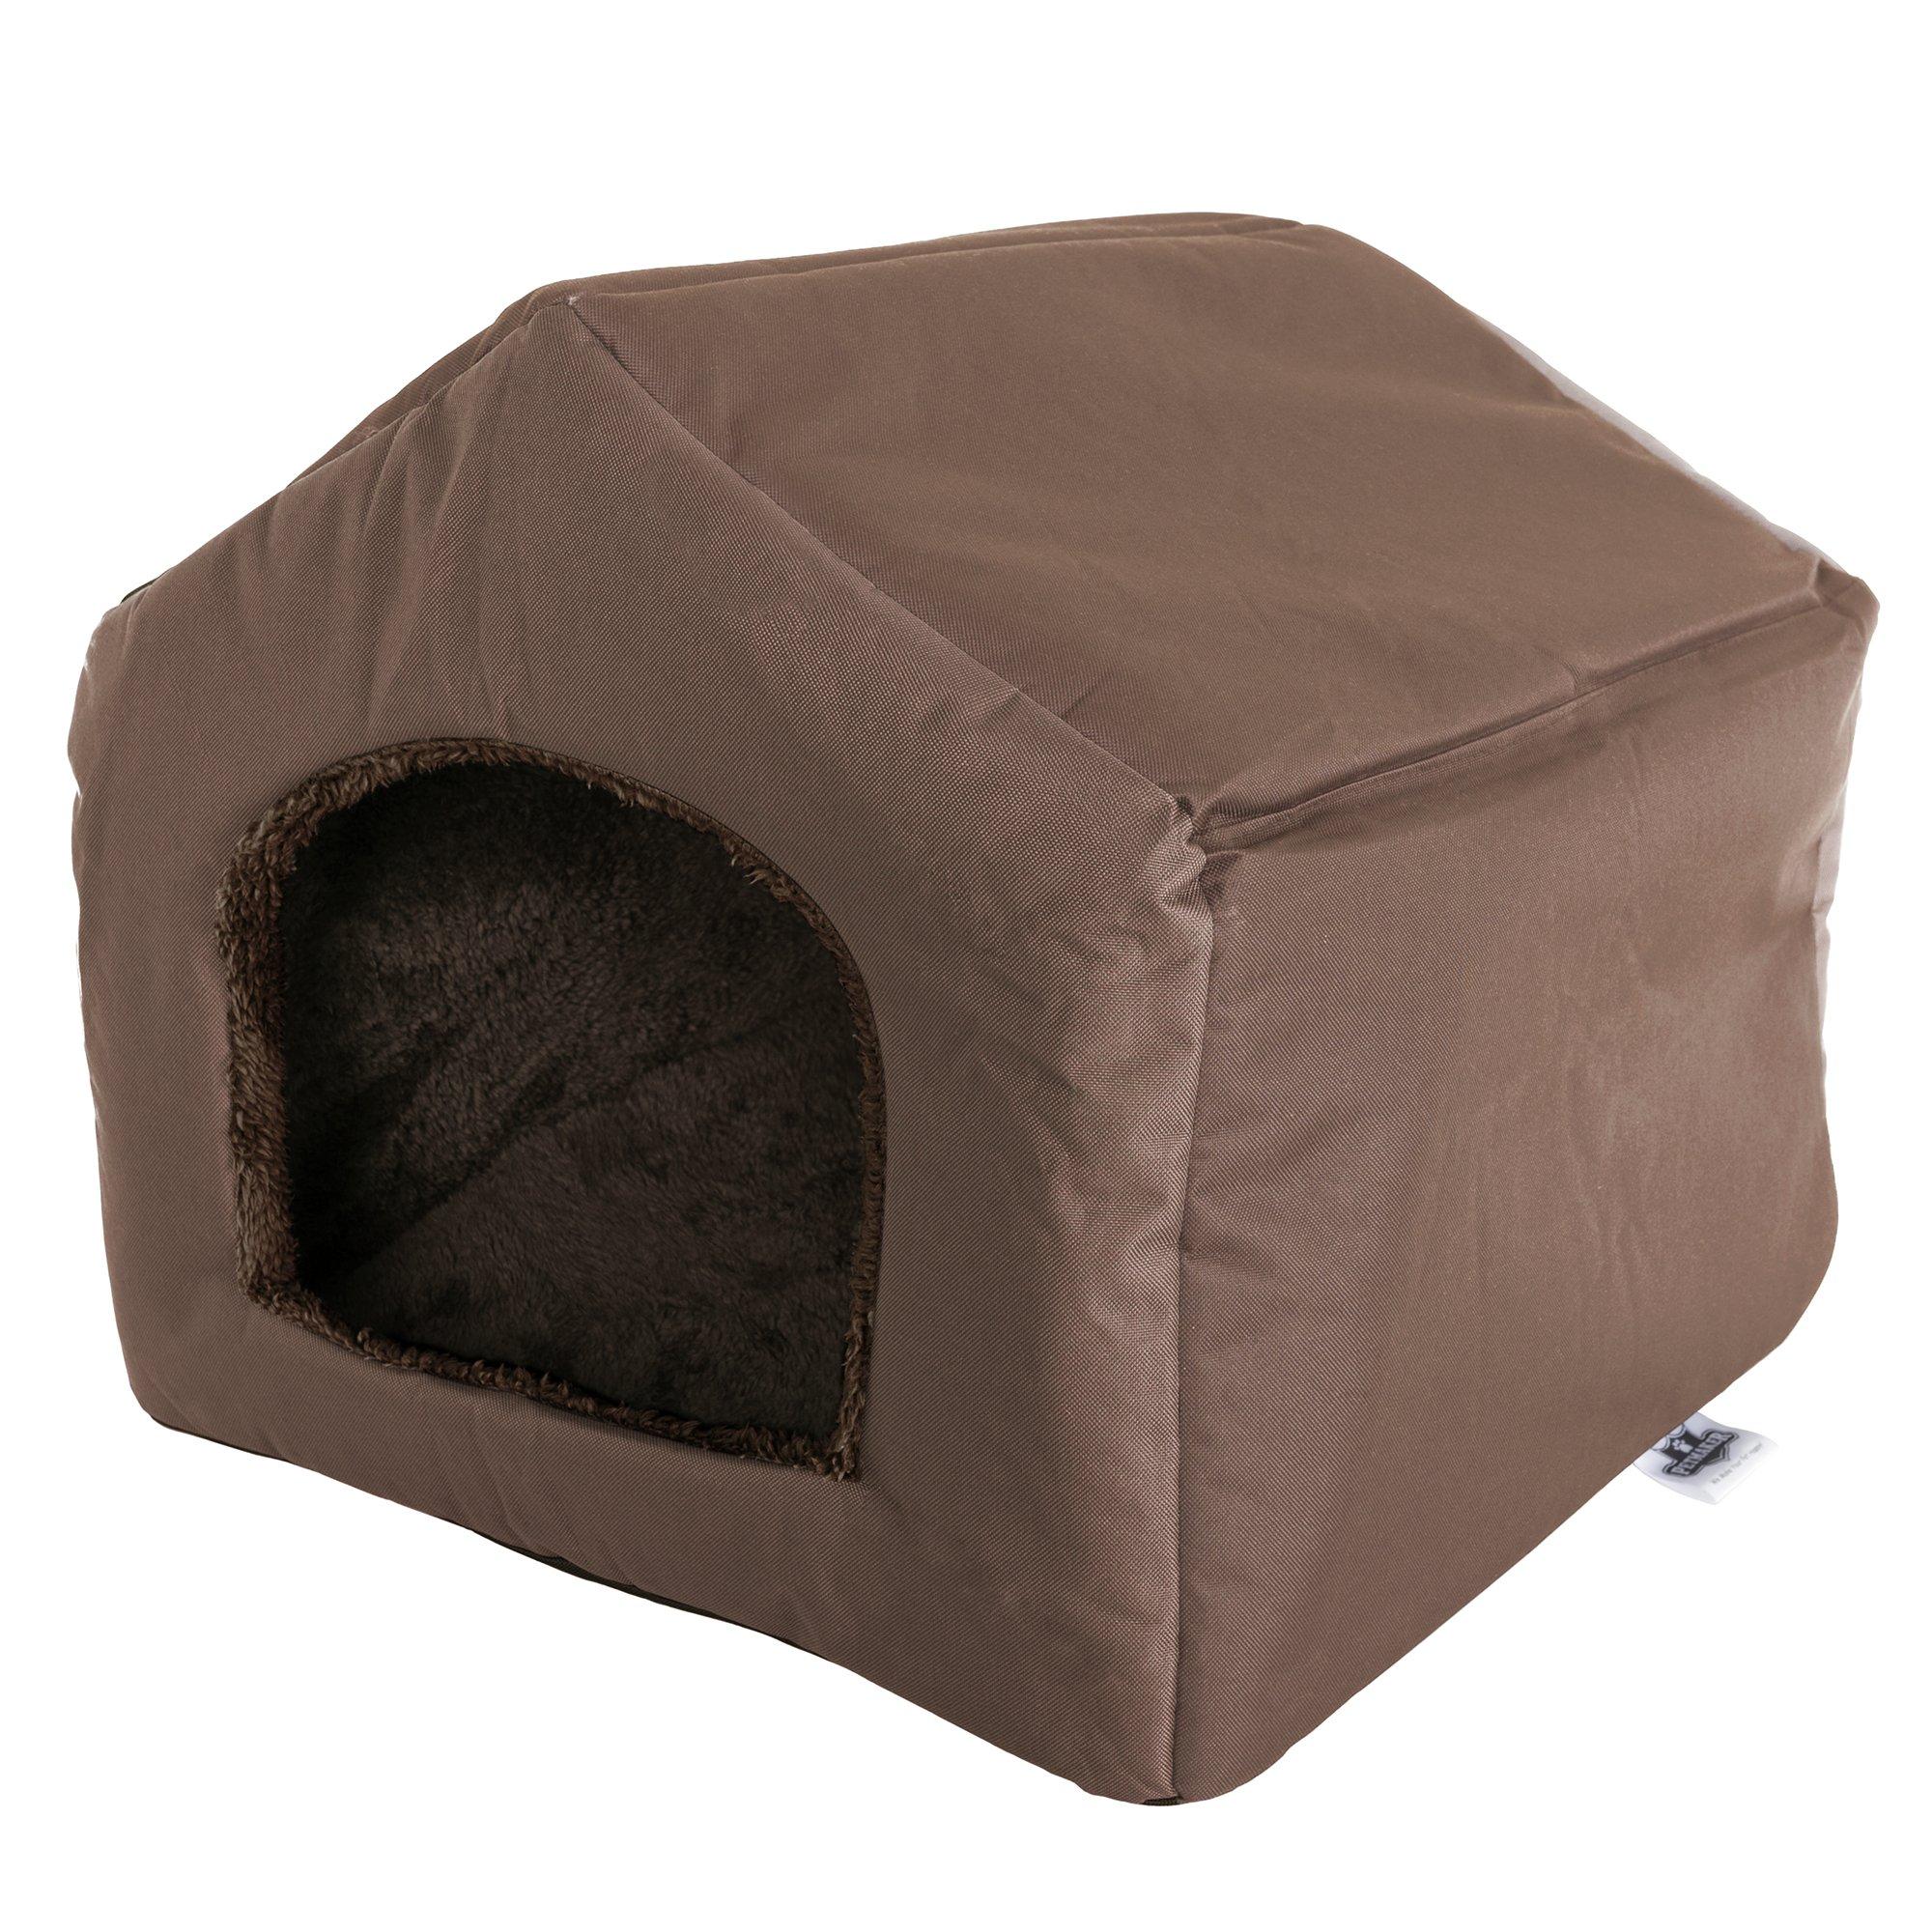 petmaker 温馨小屋房子形状宠物床 棕色 19